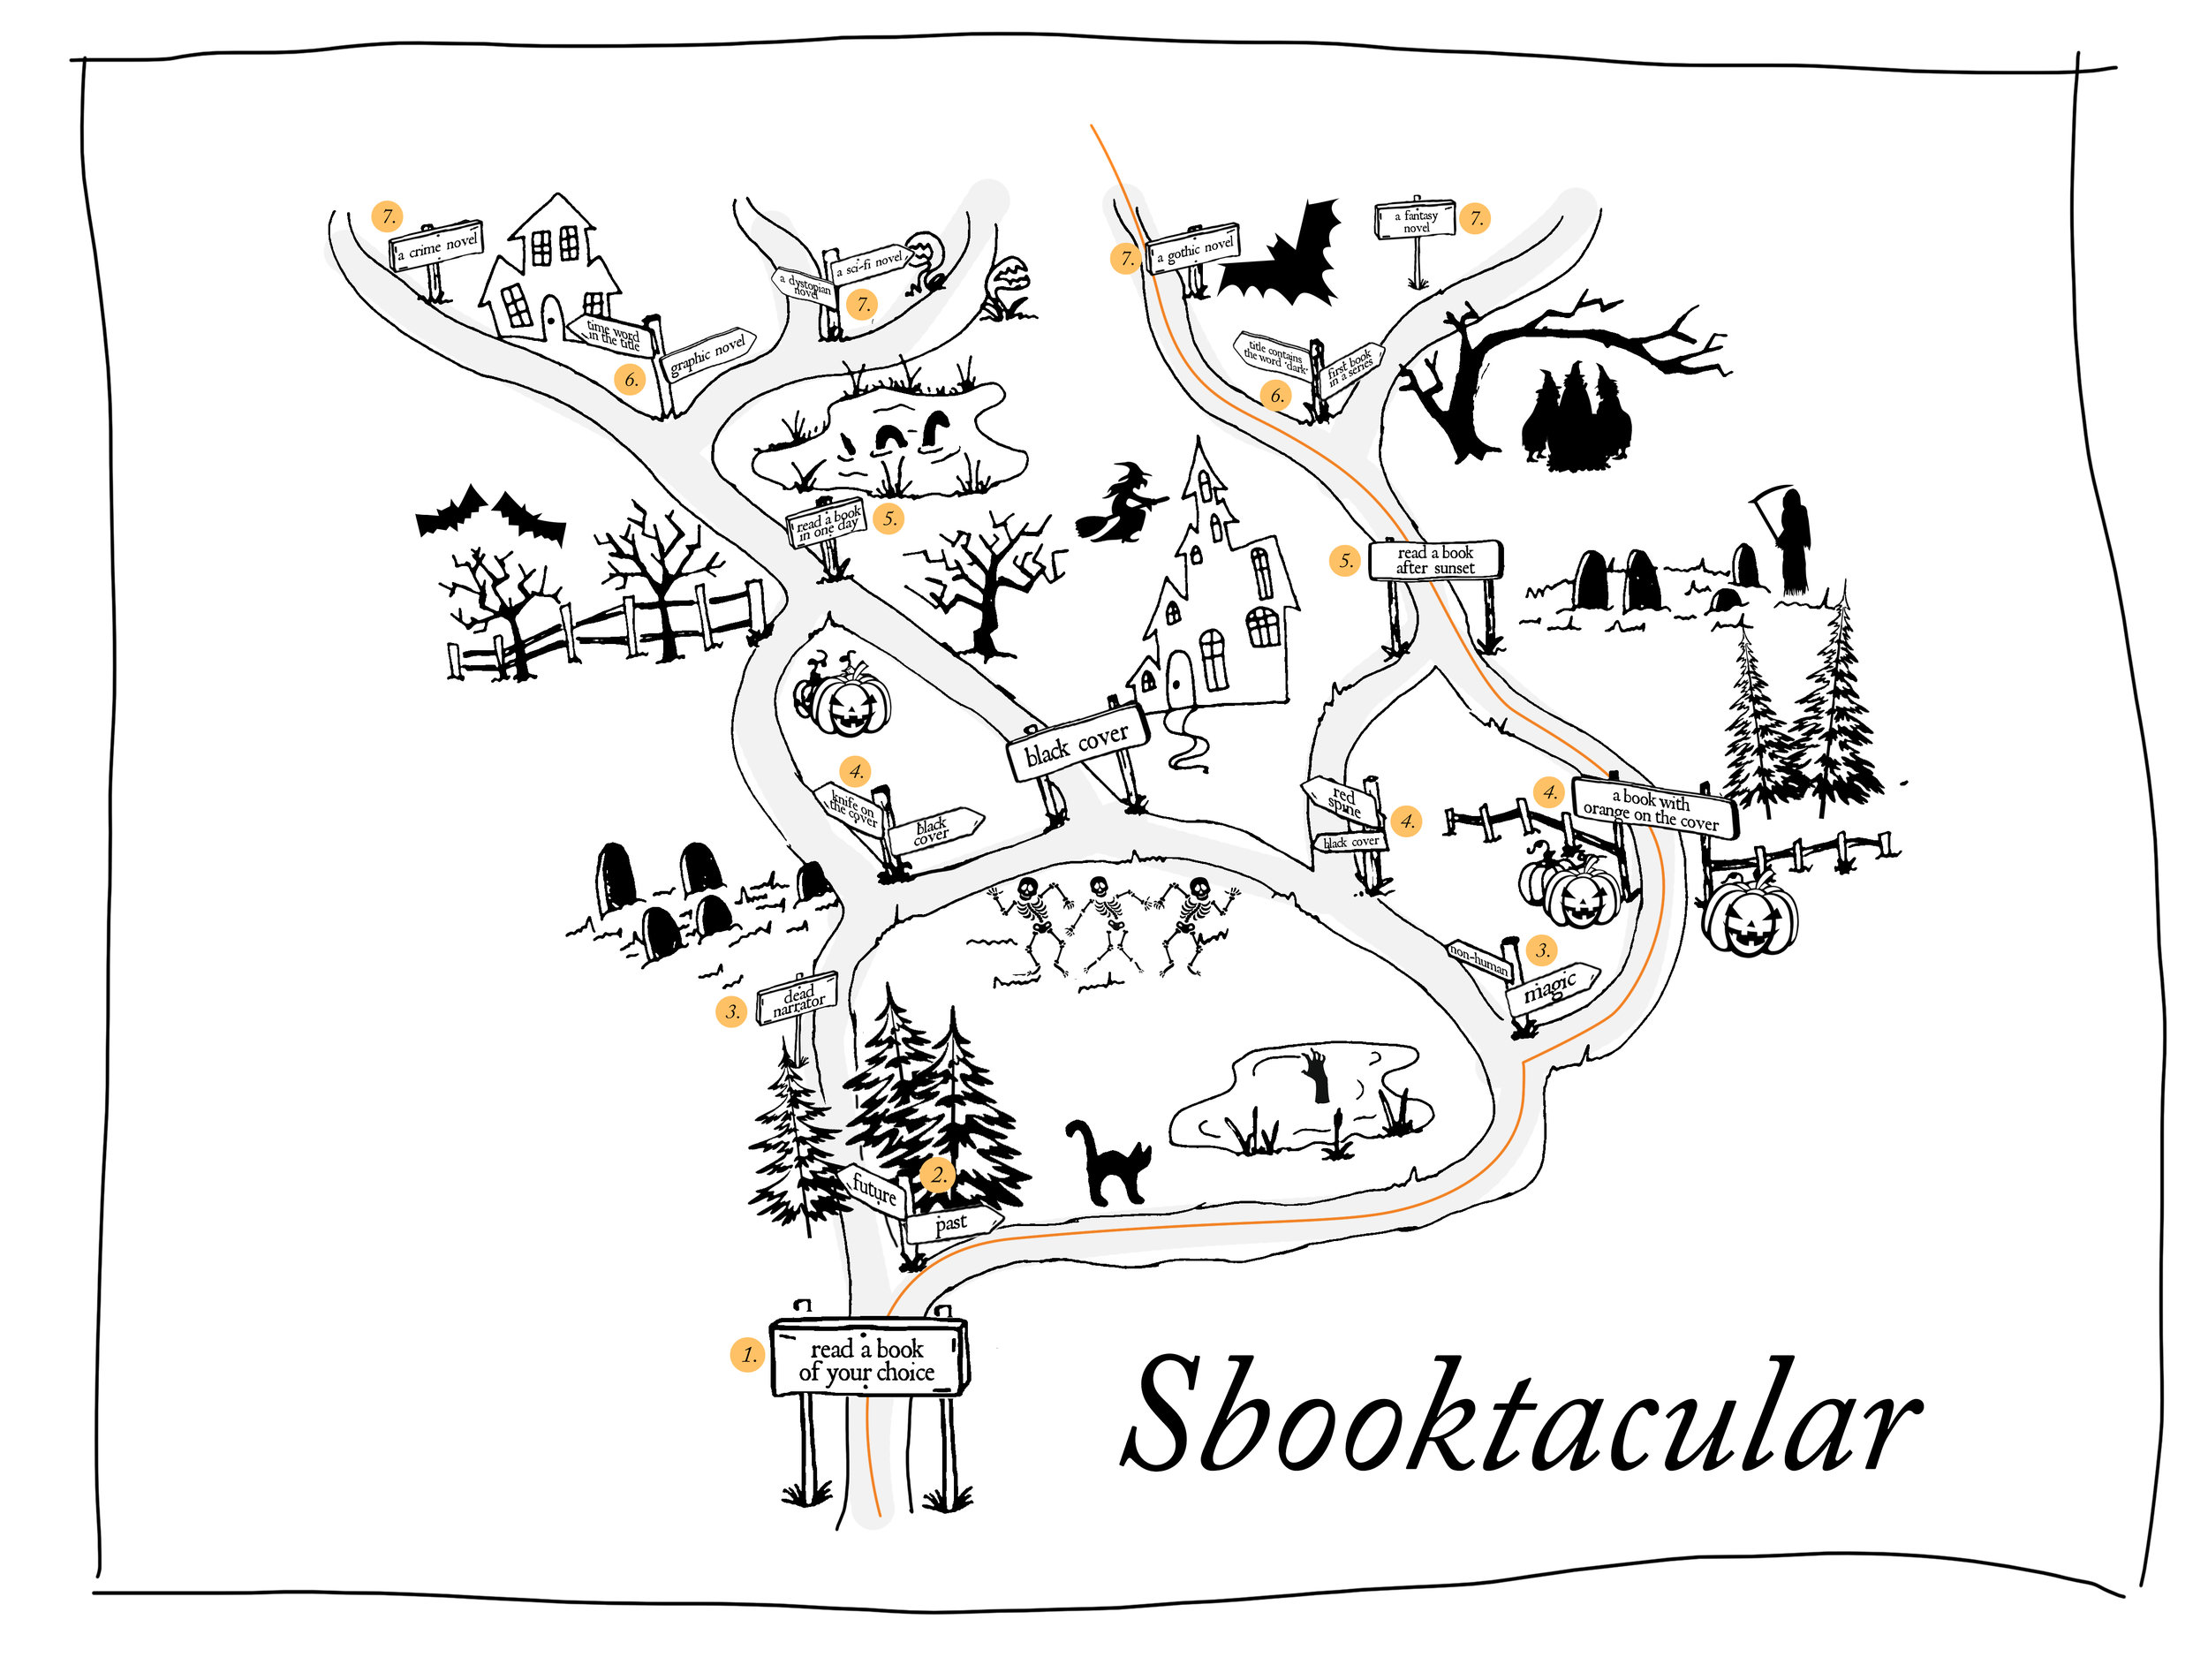 Sbooktacular example path.